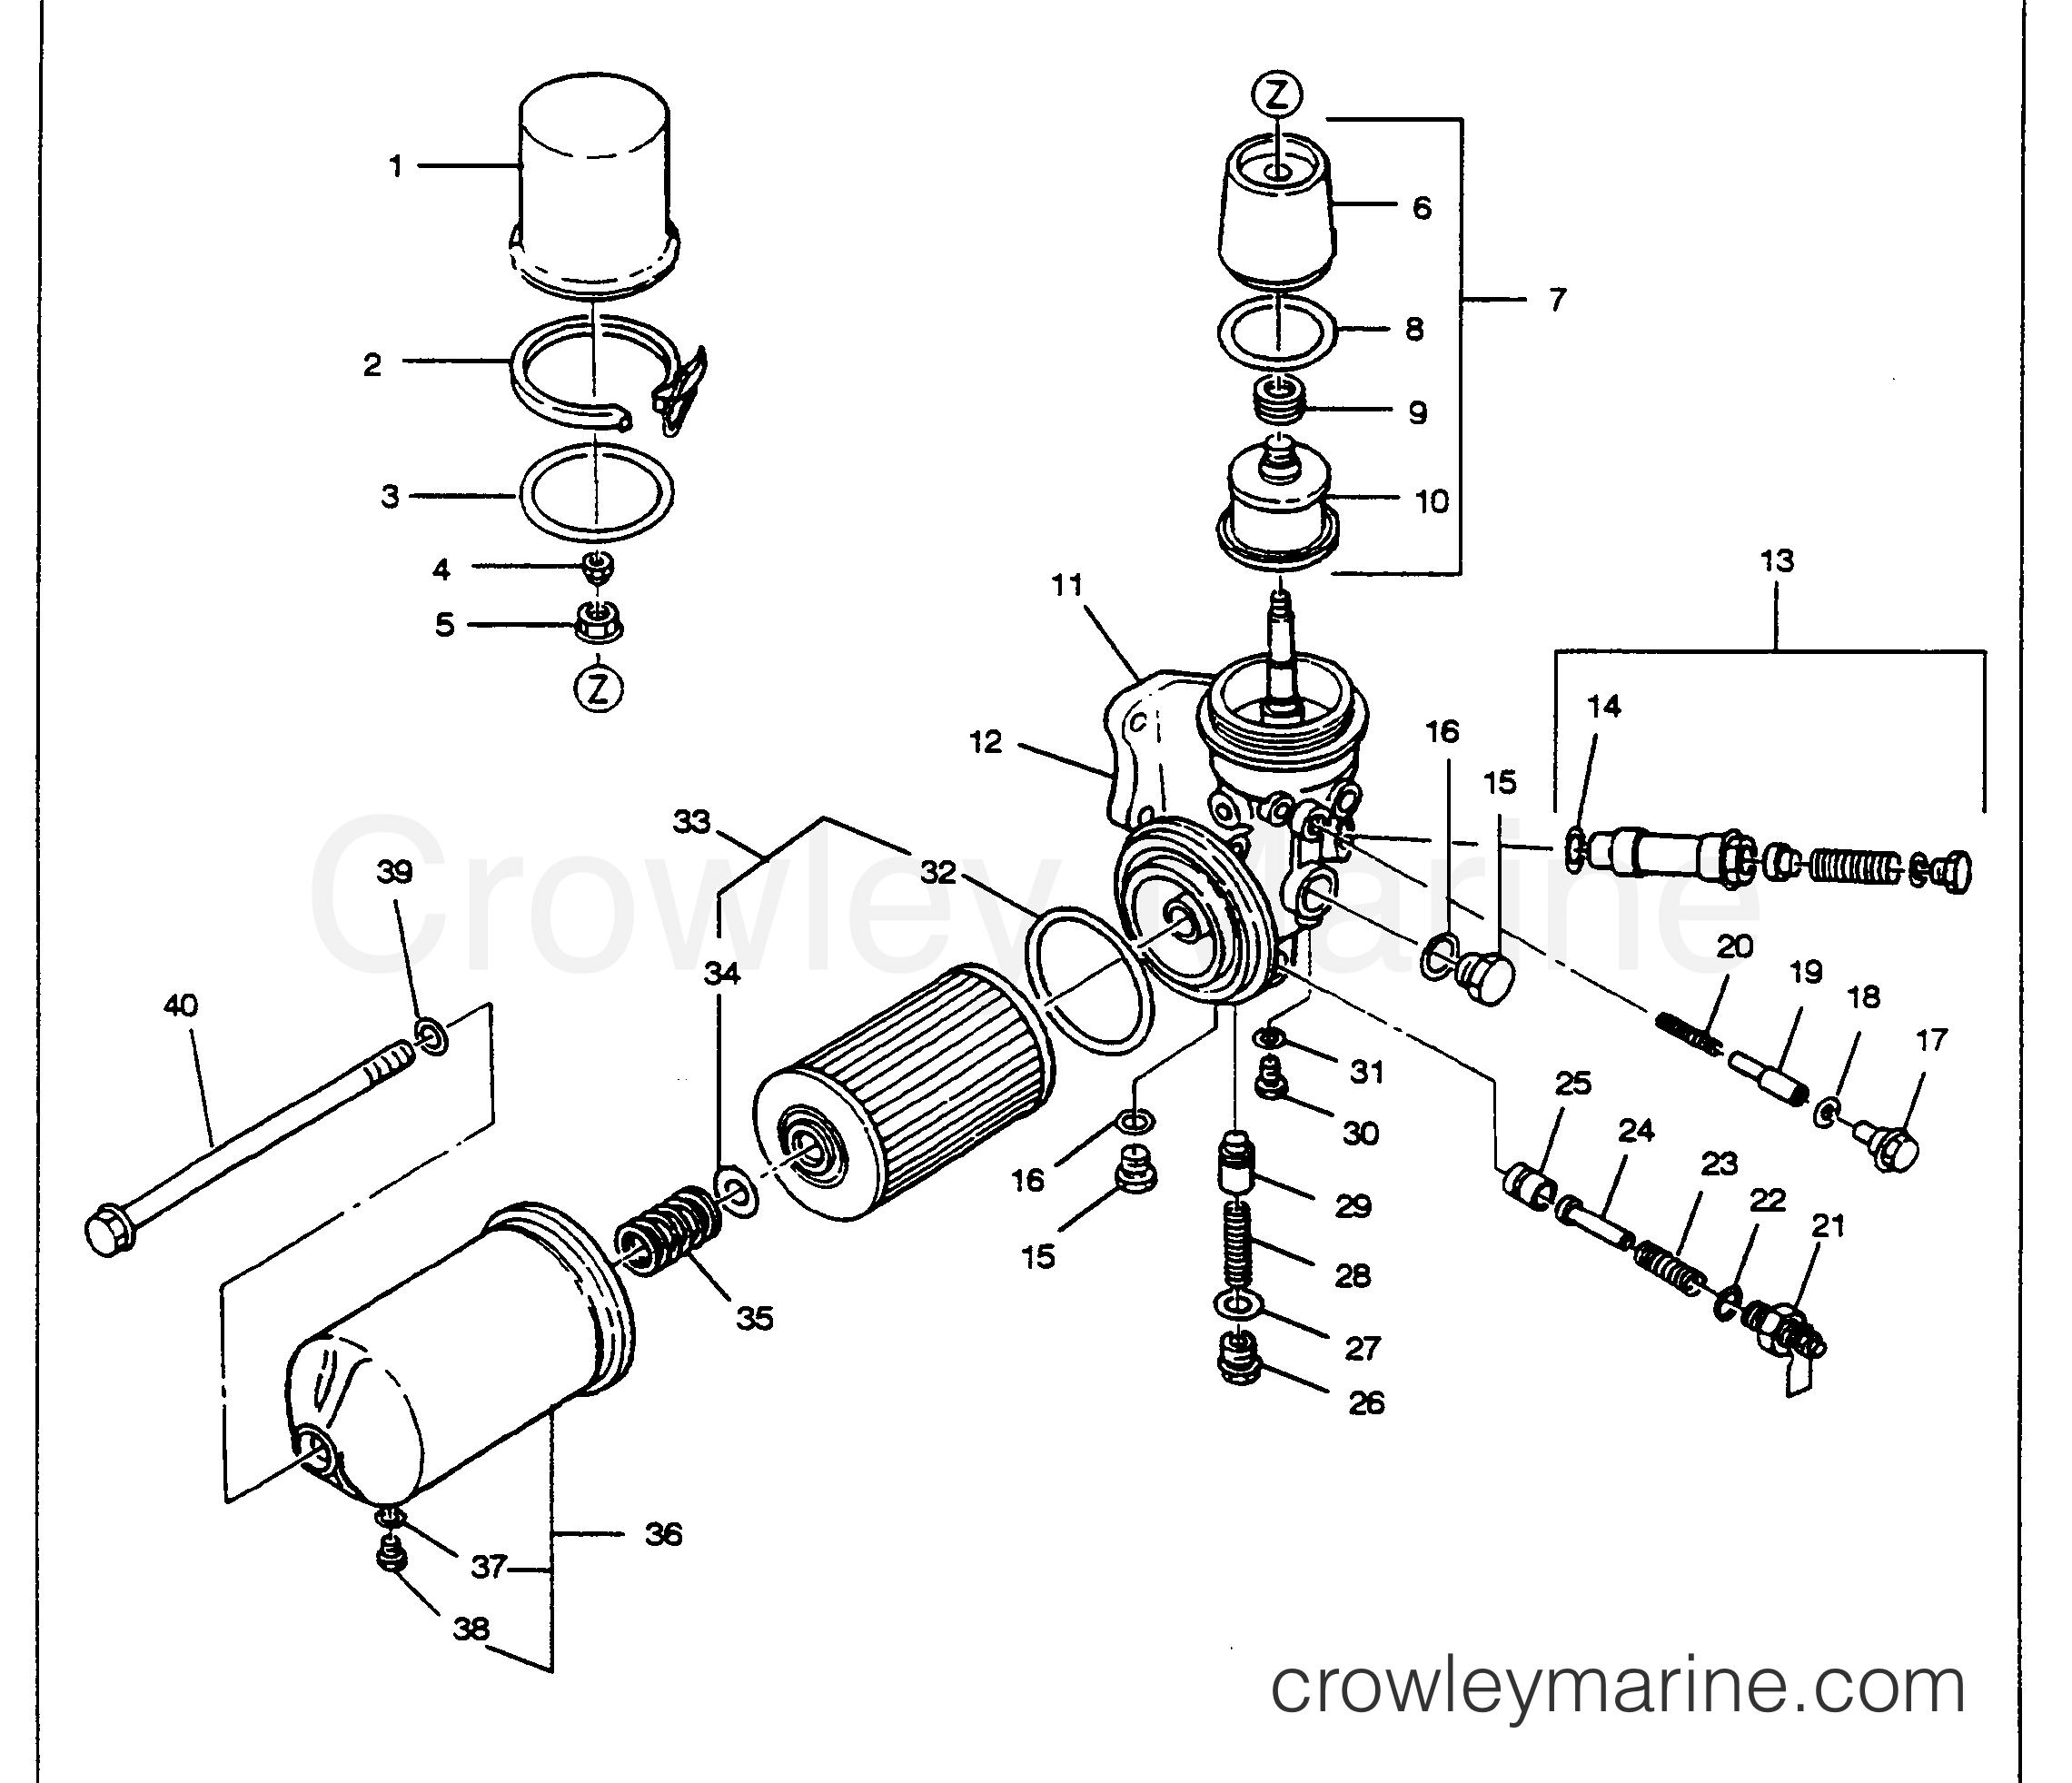 oil filter assembly figure 1-e3